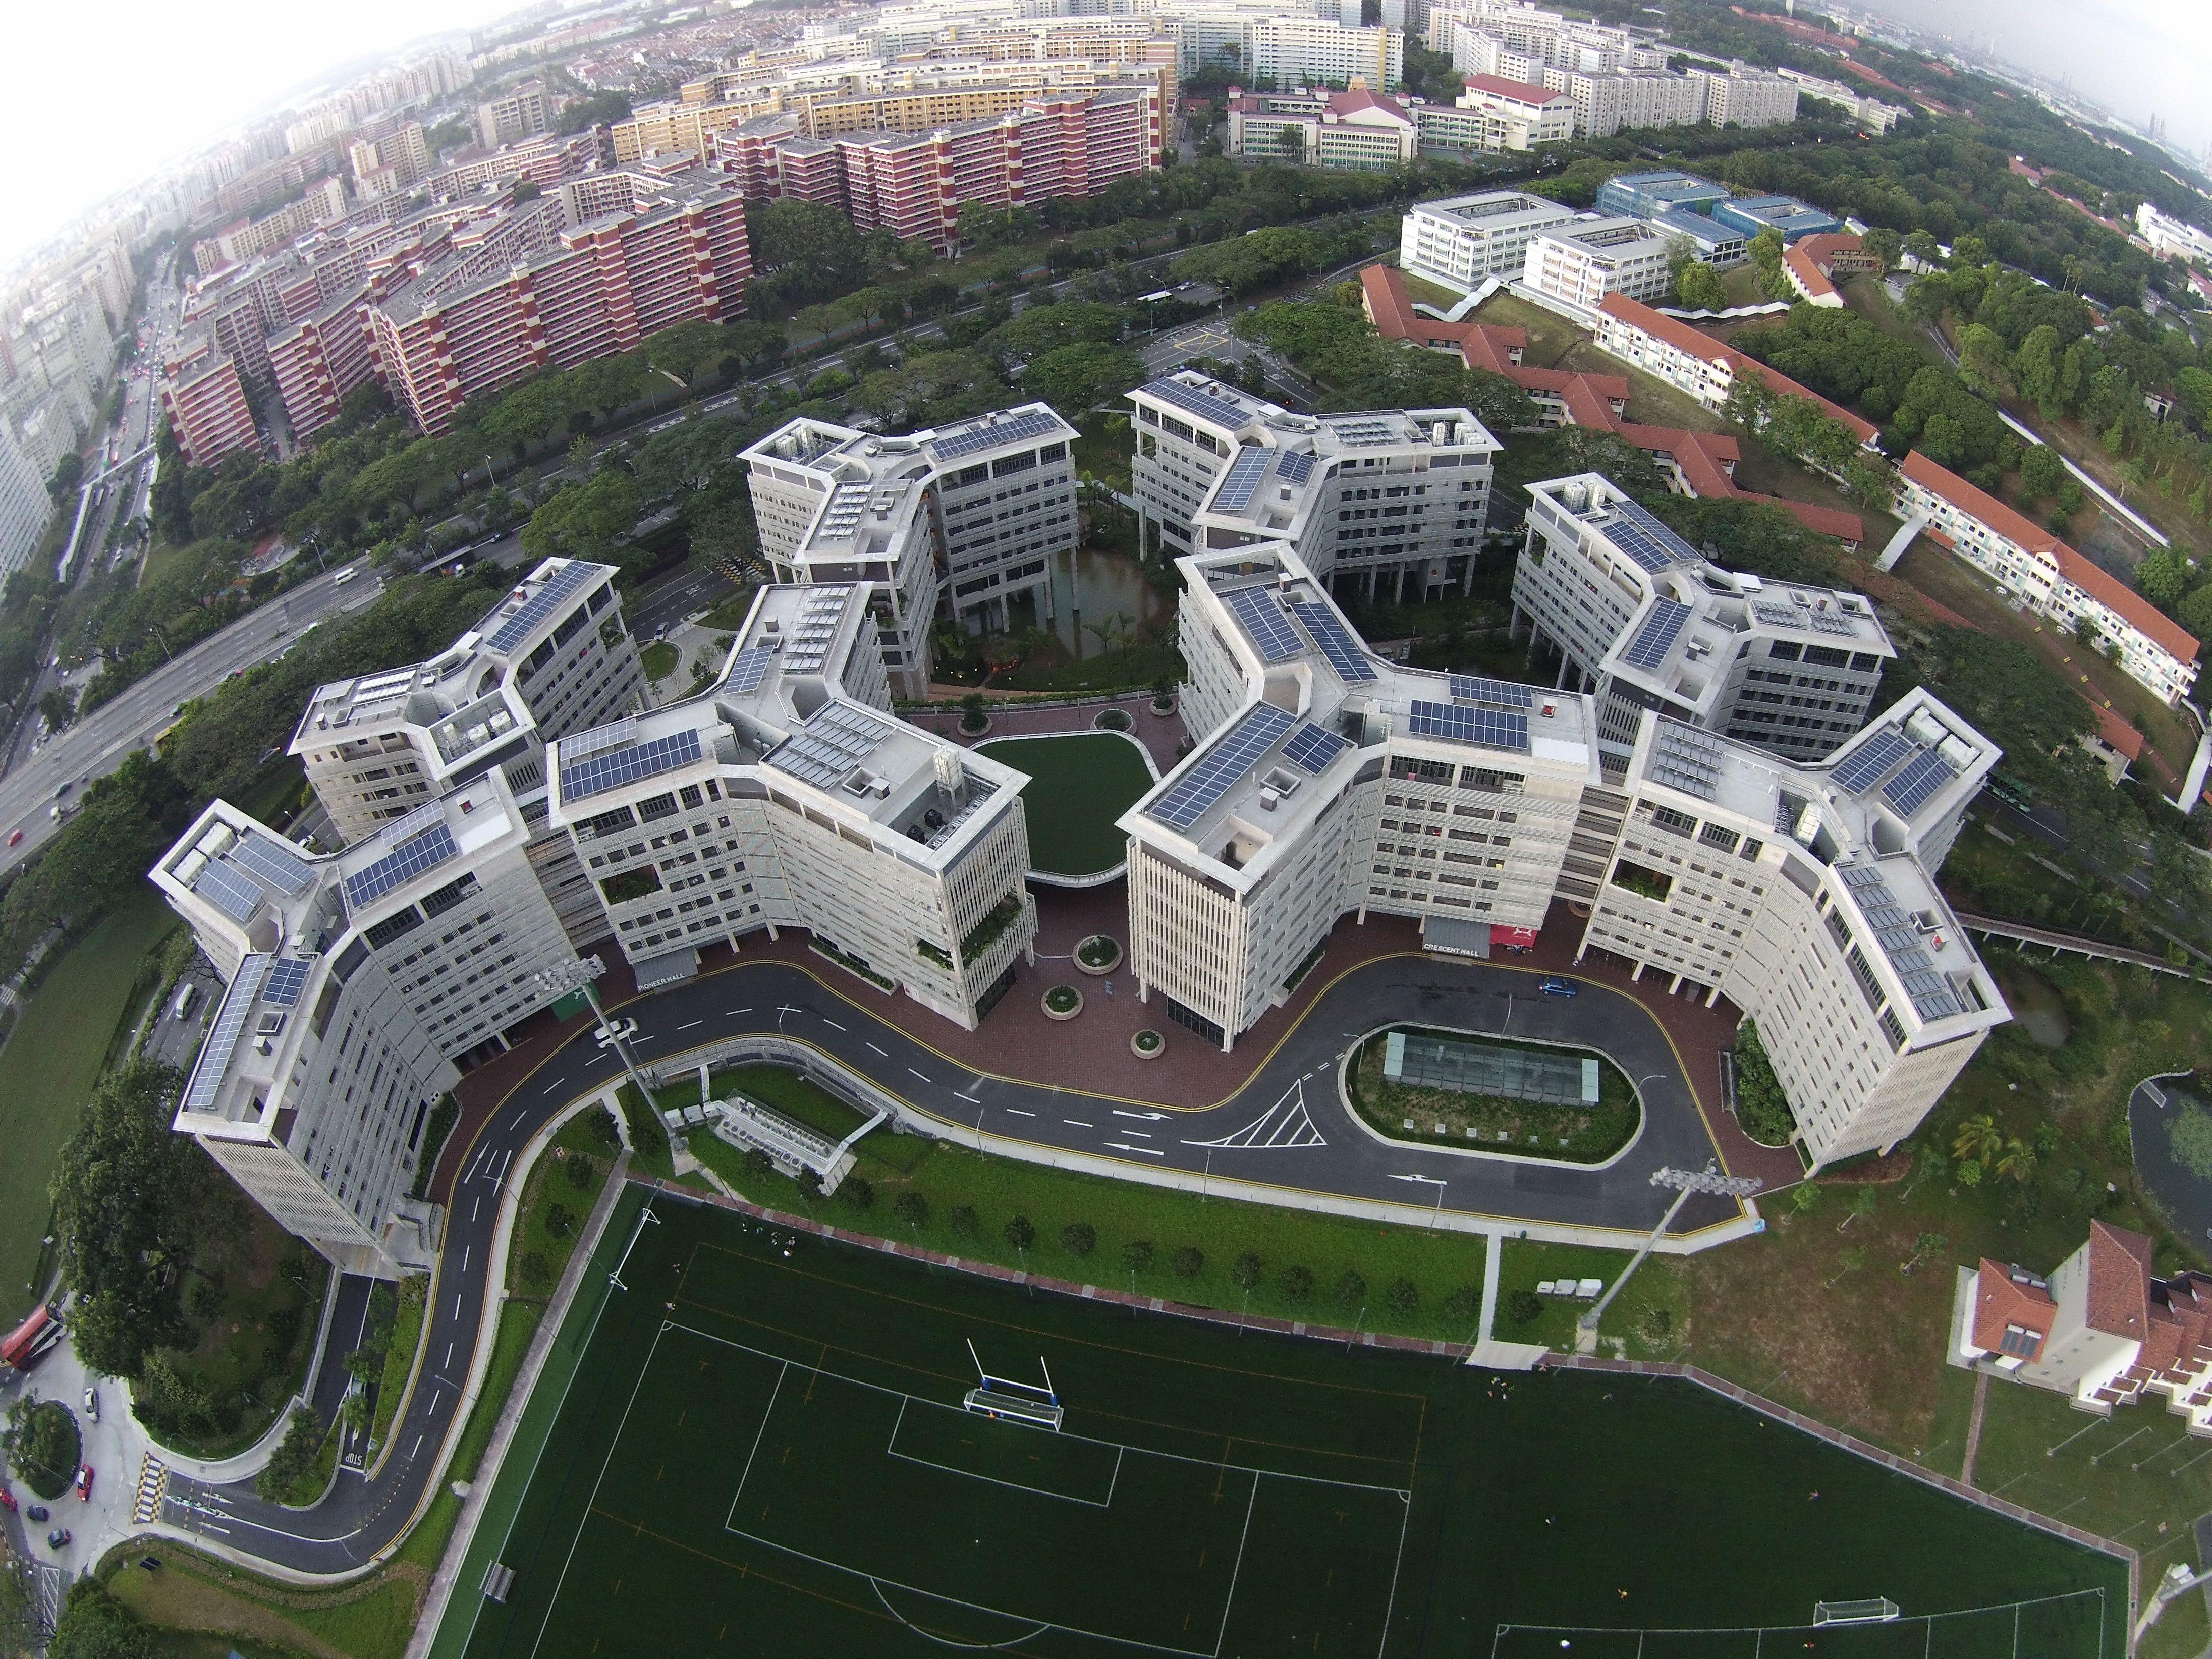 Yingli Solar Panels On The Roof Of The Nanyang Technological University  (Singapore) Halls Of